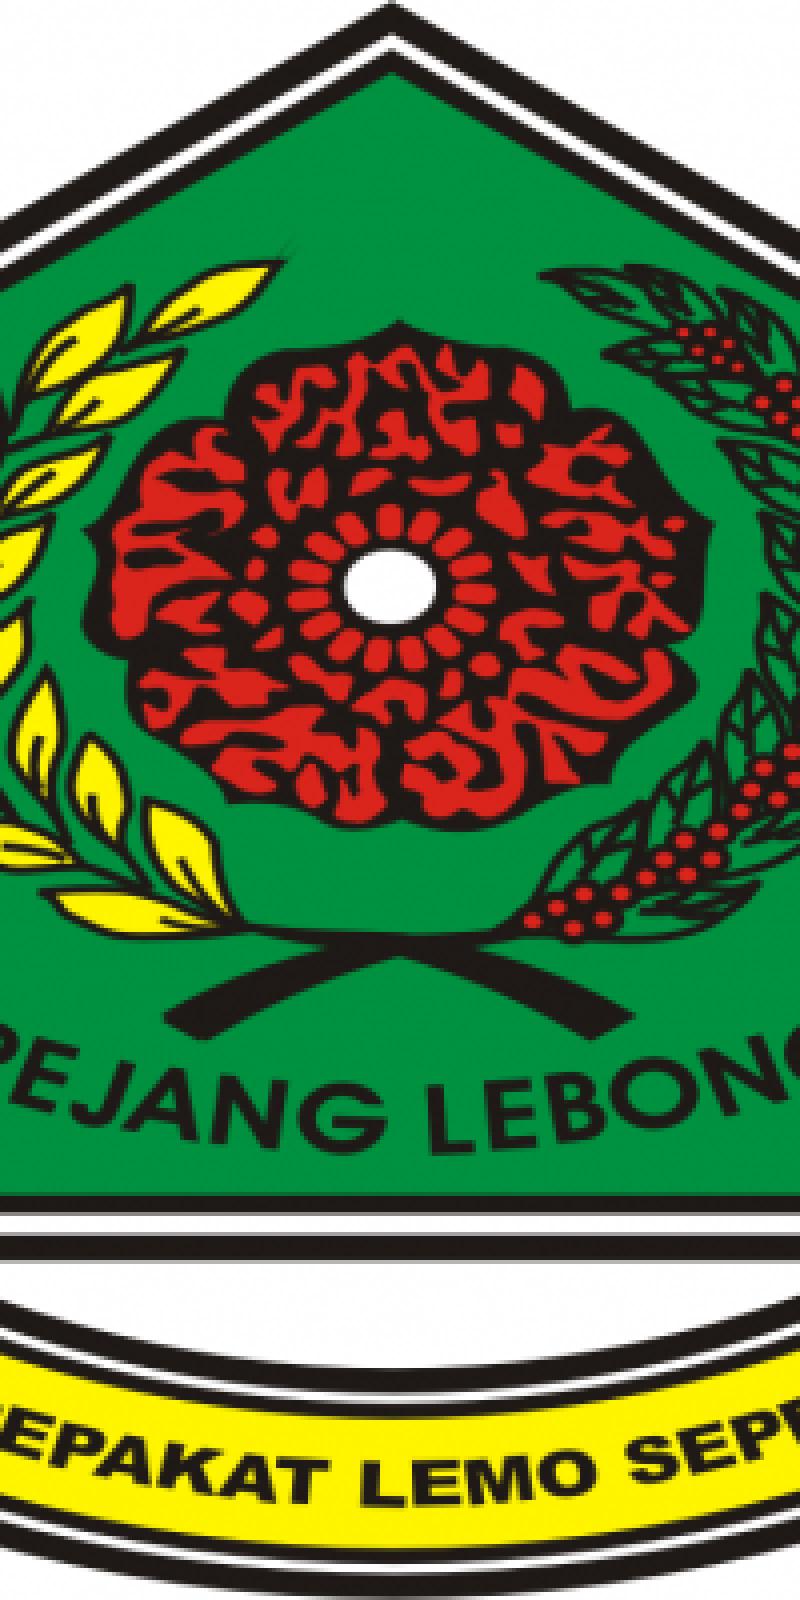 Rejanglebong Terima Bantuan Kementerian Desa Rp6 Miliar Antara News Bengkulu